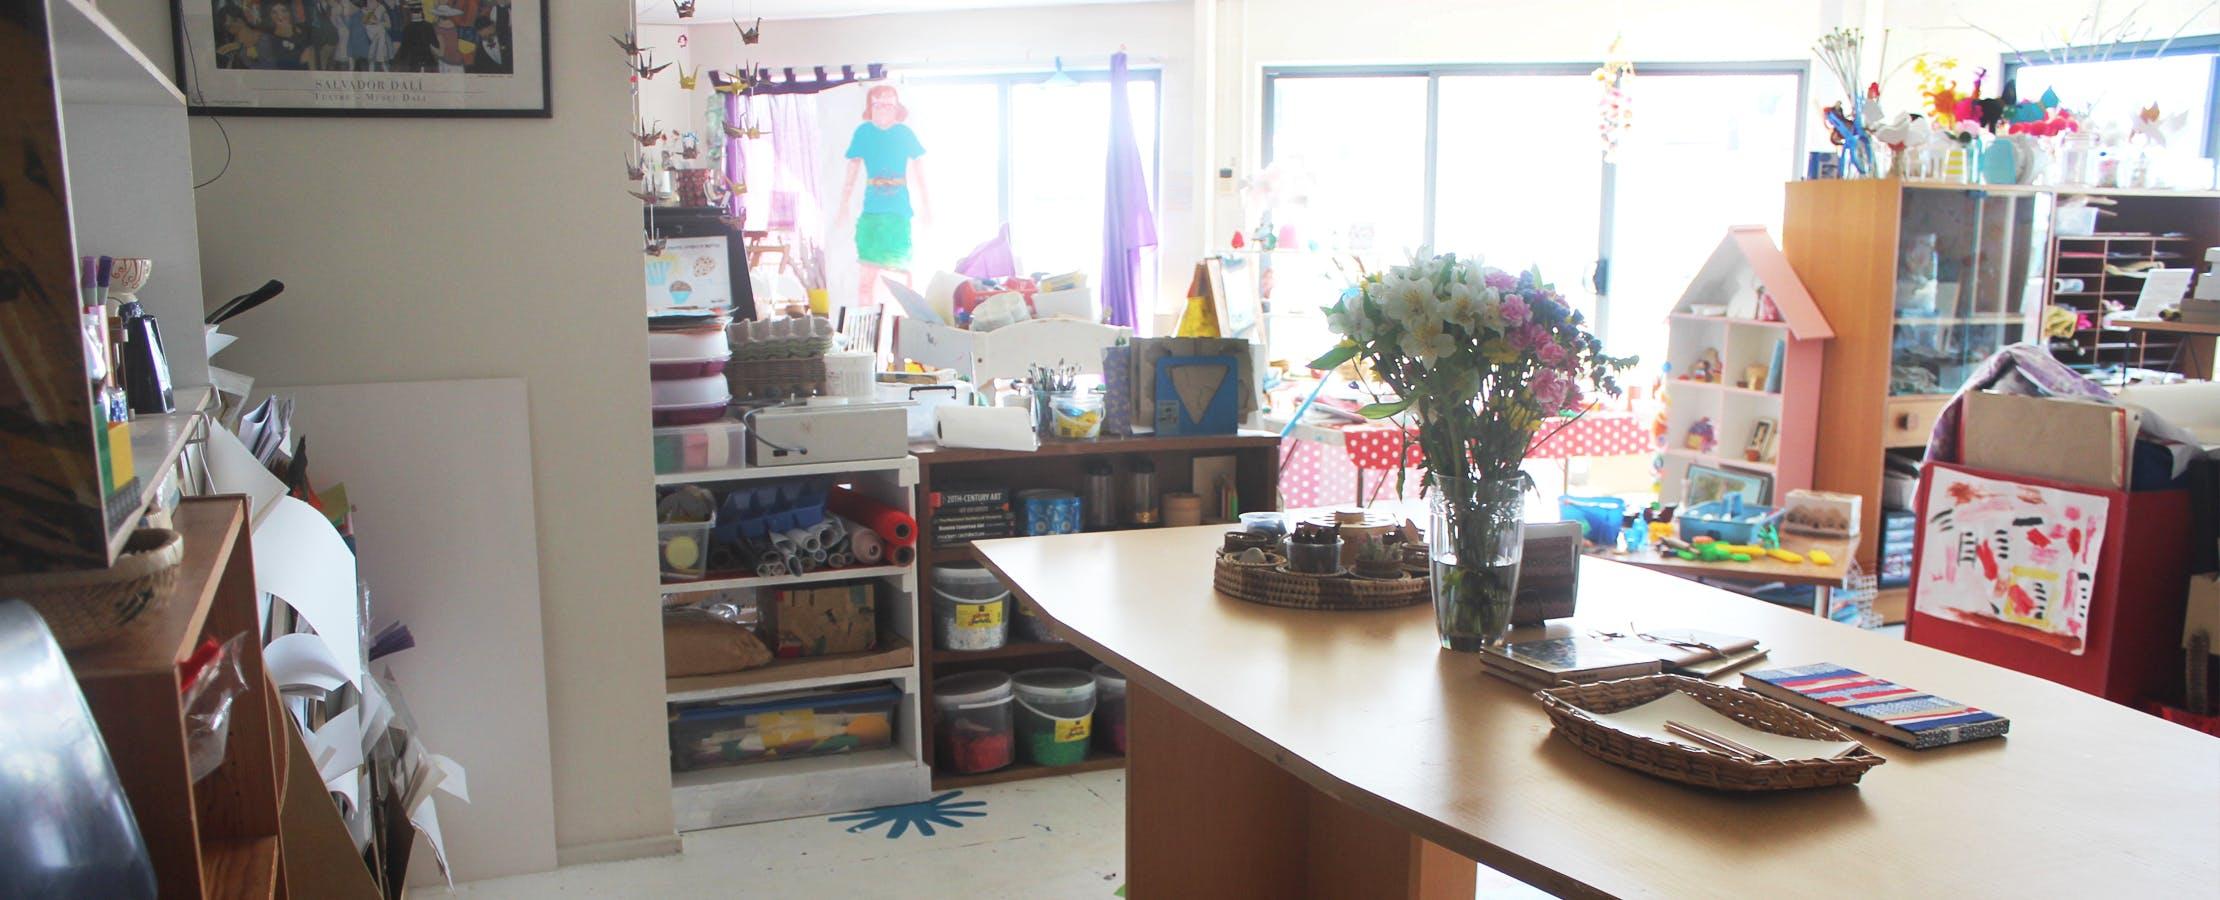 Group Table, creative studio at A Little Creative Studio, image 1